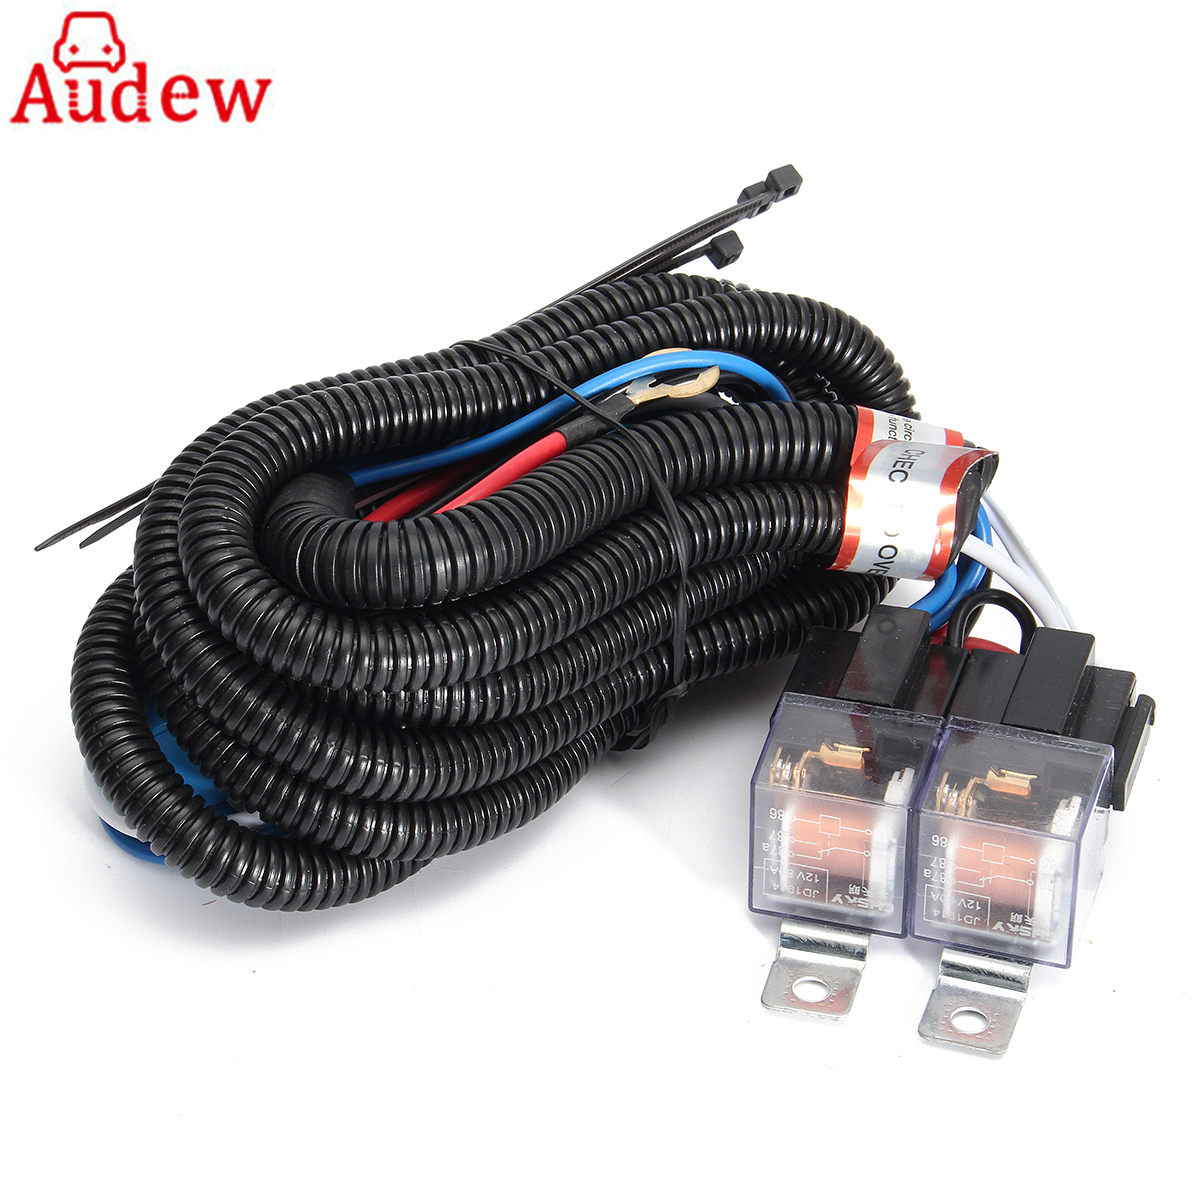 Top 10 Most Popular Headlight Relay Wiring Harness List. Car 12 V H4 4 L Bulbs Headlight Wire Wiring Harness Ceramic Relay Socket. Wiring. H4 Headlight Relay Wiring Harness At Scoala.co